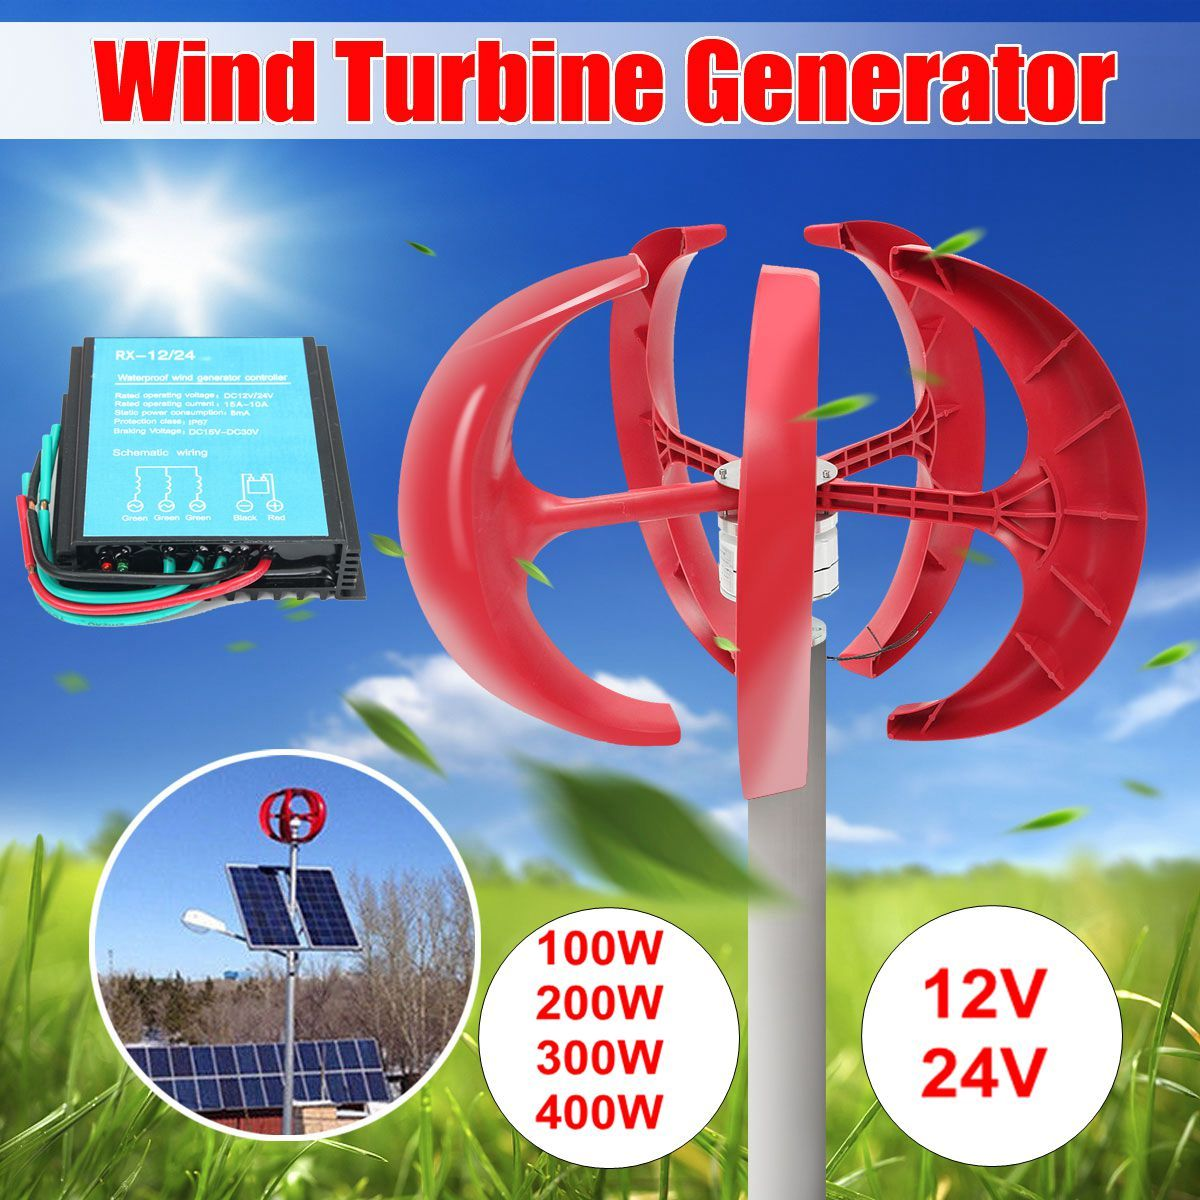 400 w 12 v/24 v Vertikale-Achse 5-Klingen 3-Phase AC Permanent-Magnet synchron Wind Generator